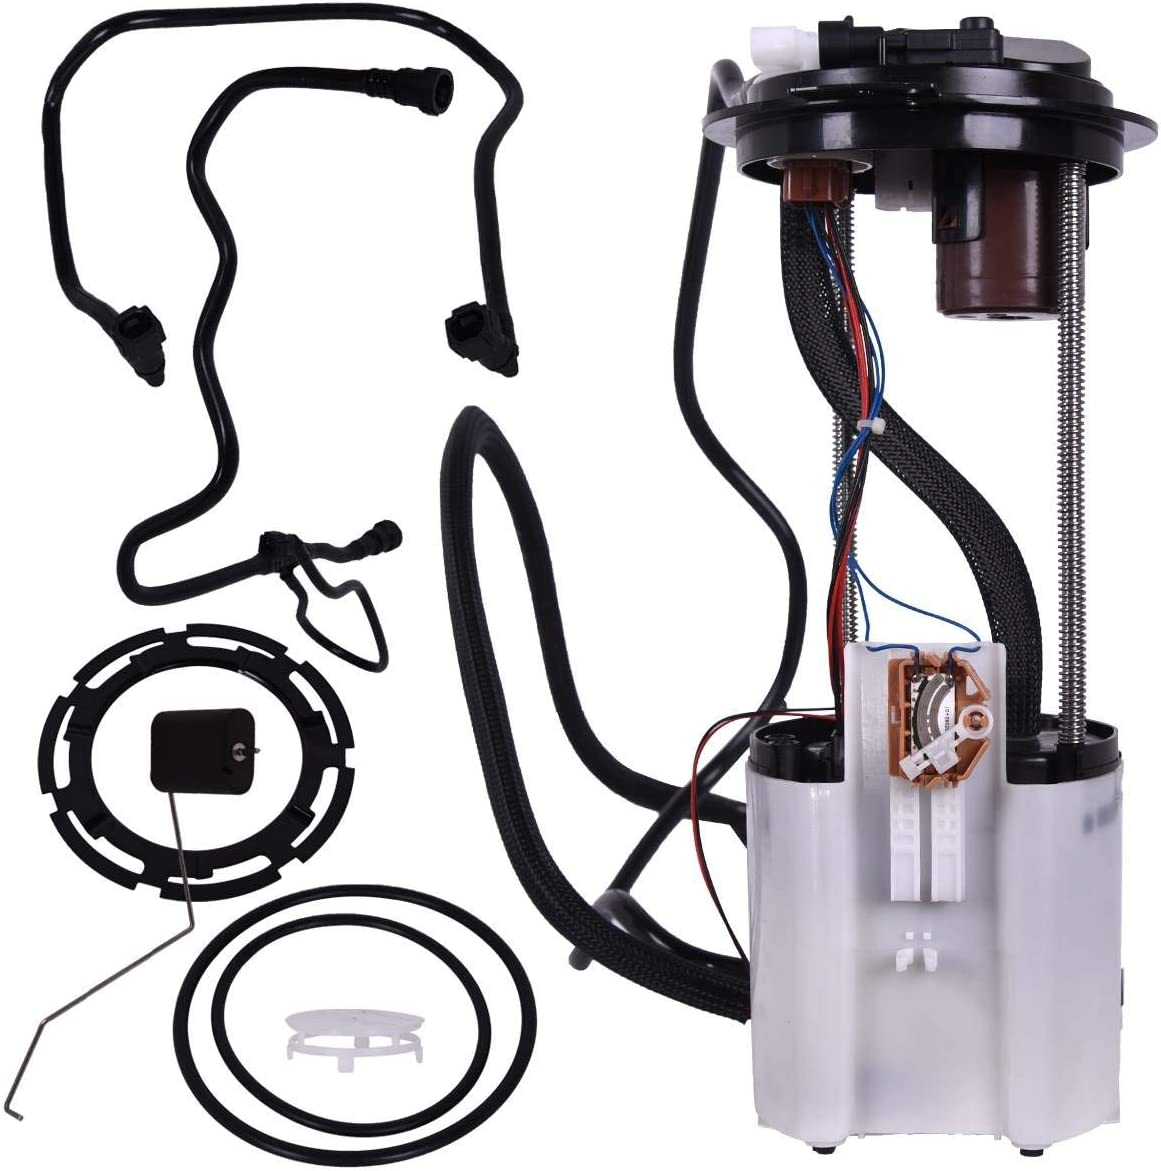 Bapmic E3626M Fuel Pump Module for Chevrolet Equi 安値 Assembly 25%OFF 05-06